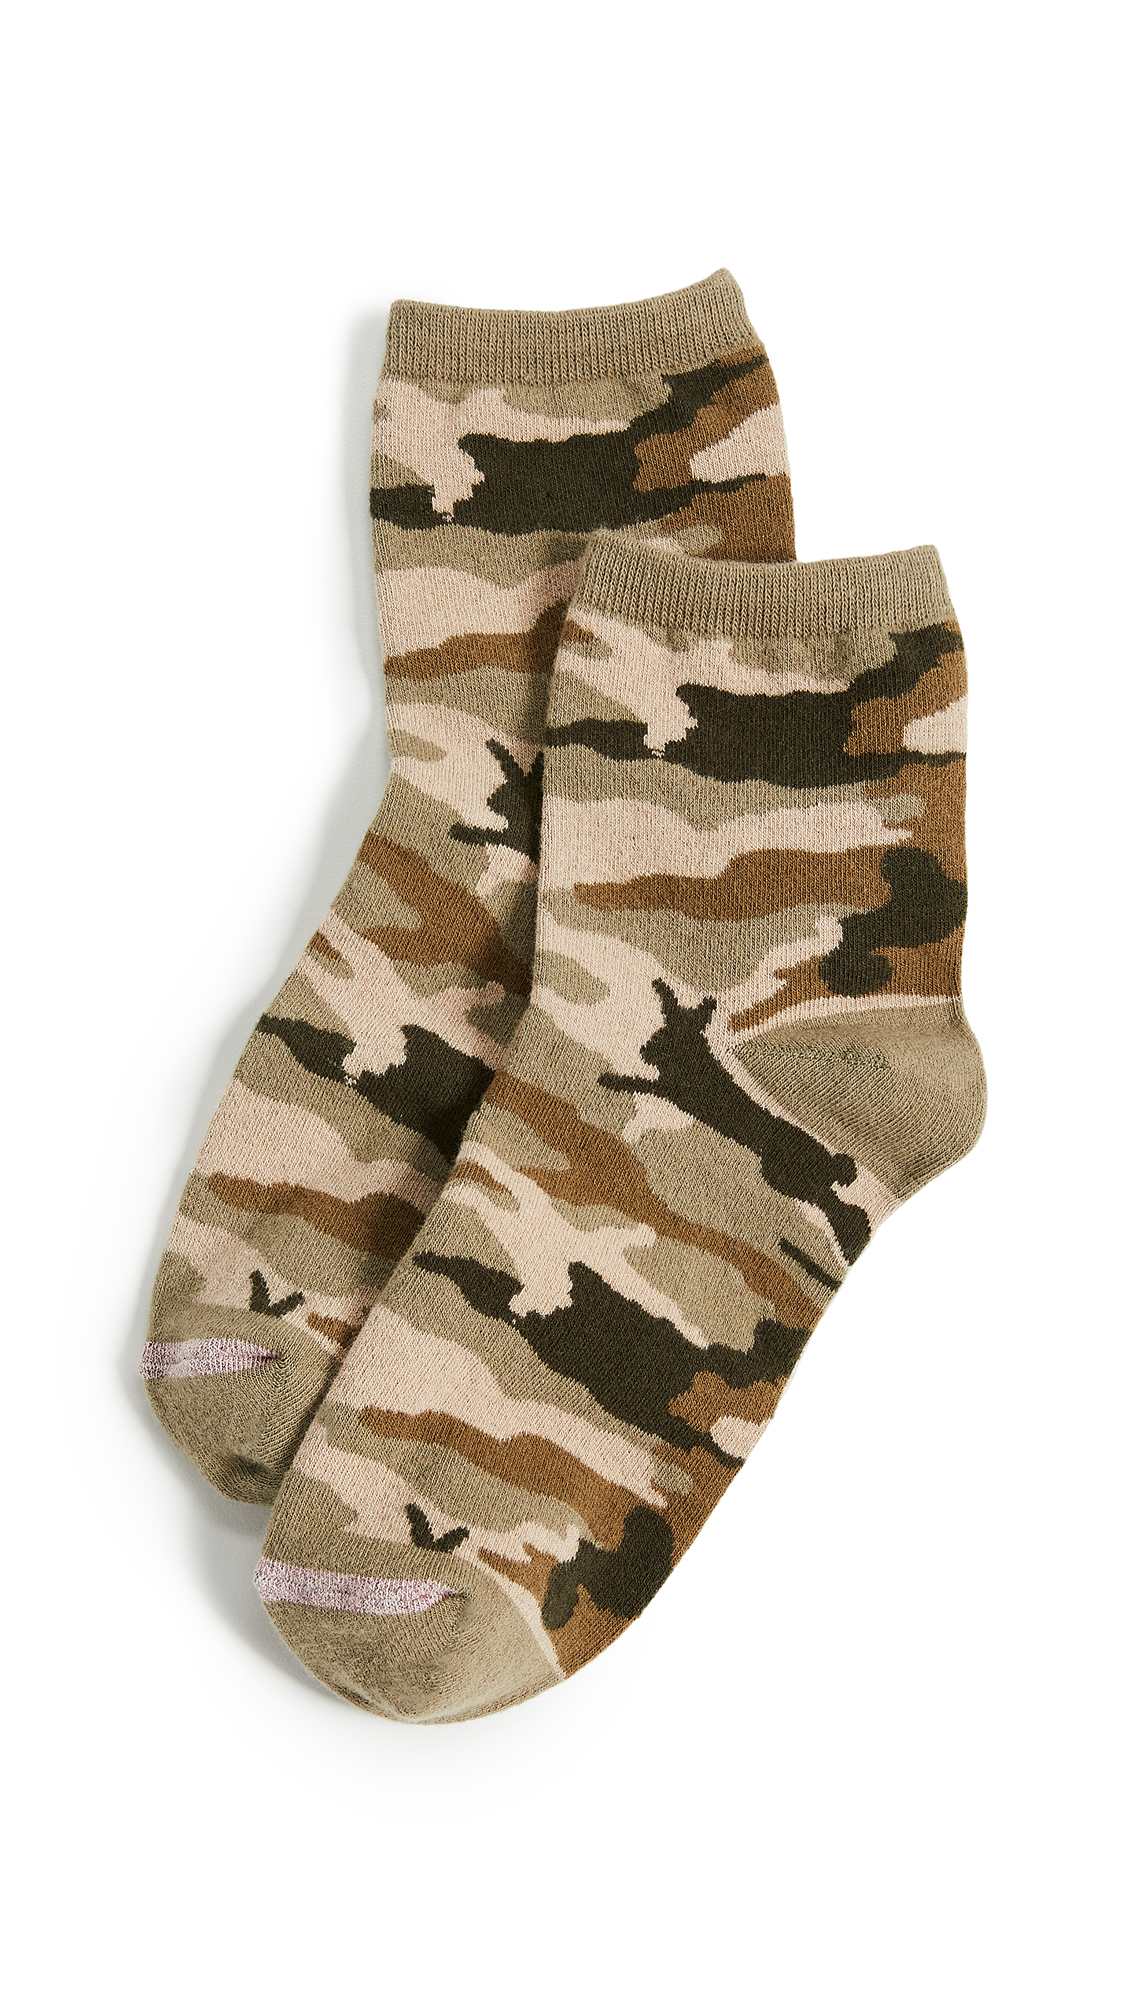 Madewell Camo Bunny Ankle Mid Socks In Camo